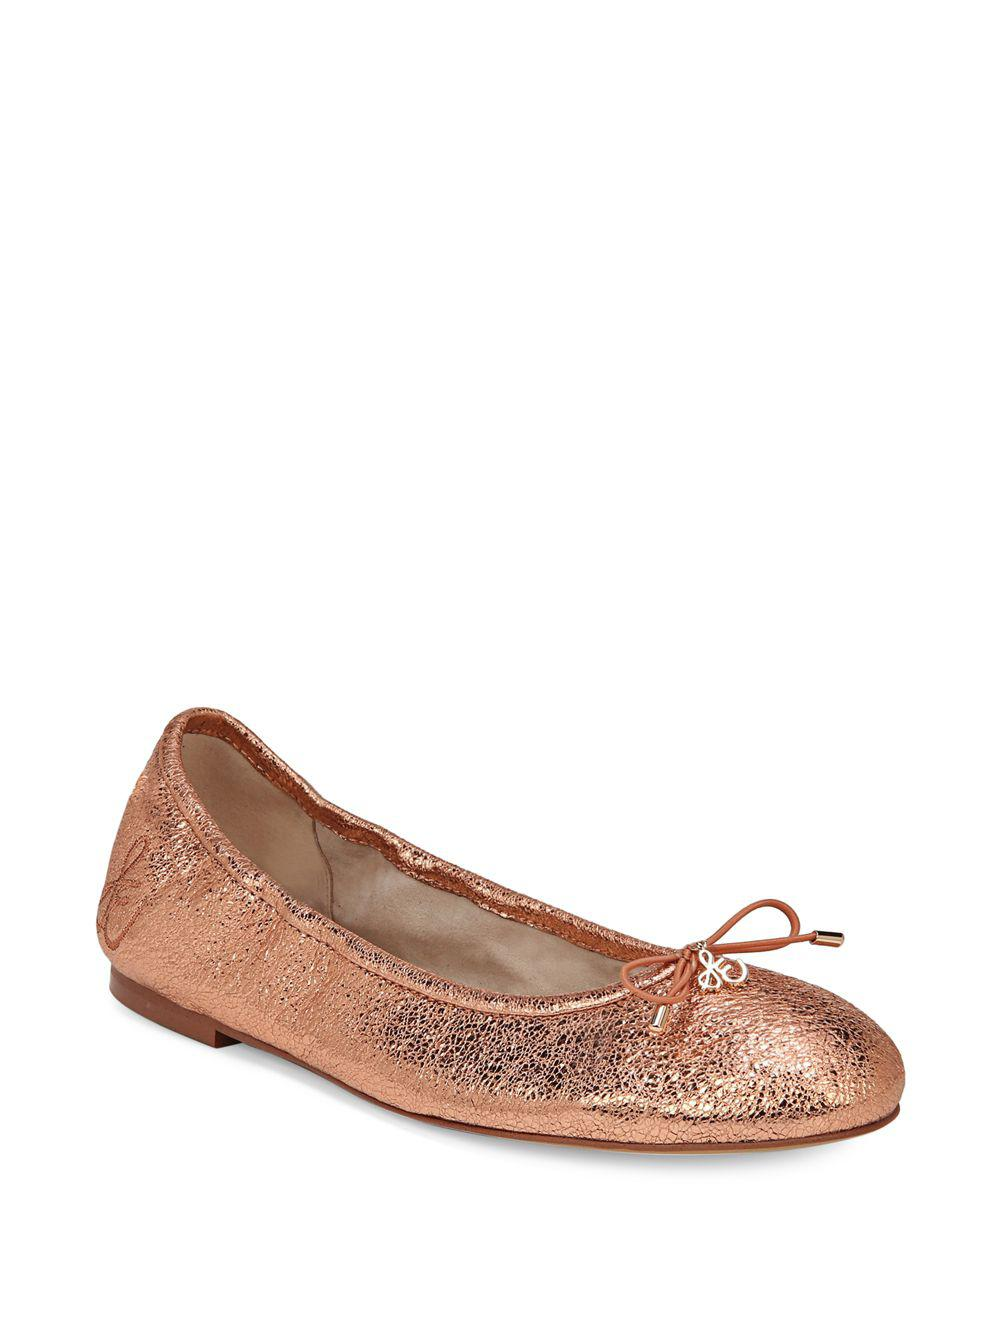 ff10f614a96a8 Sam Edelman. Women s Felicia Ballet Flats.  100  55 From Saks OFF 5TH